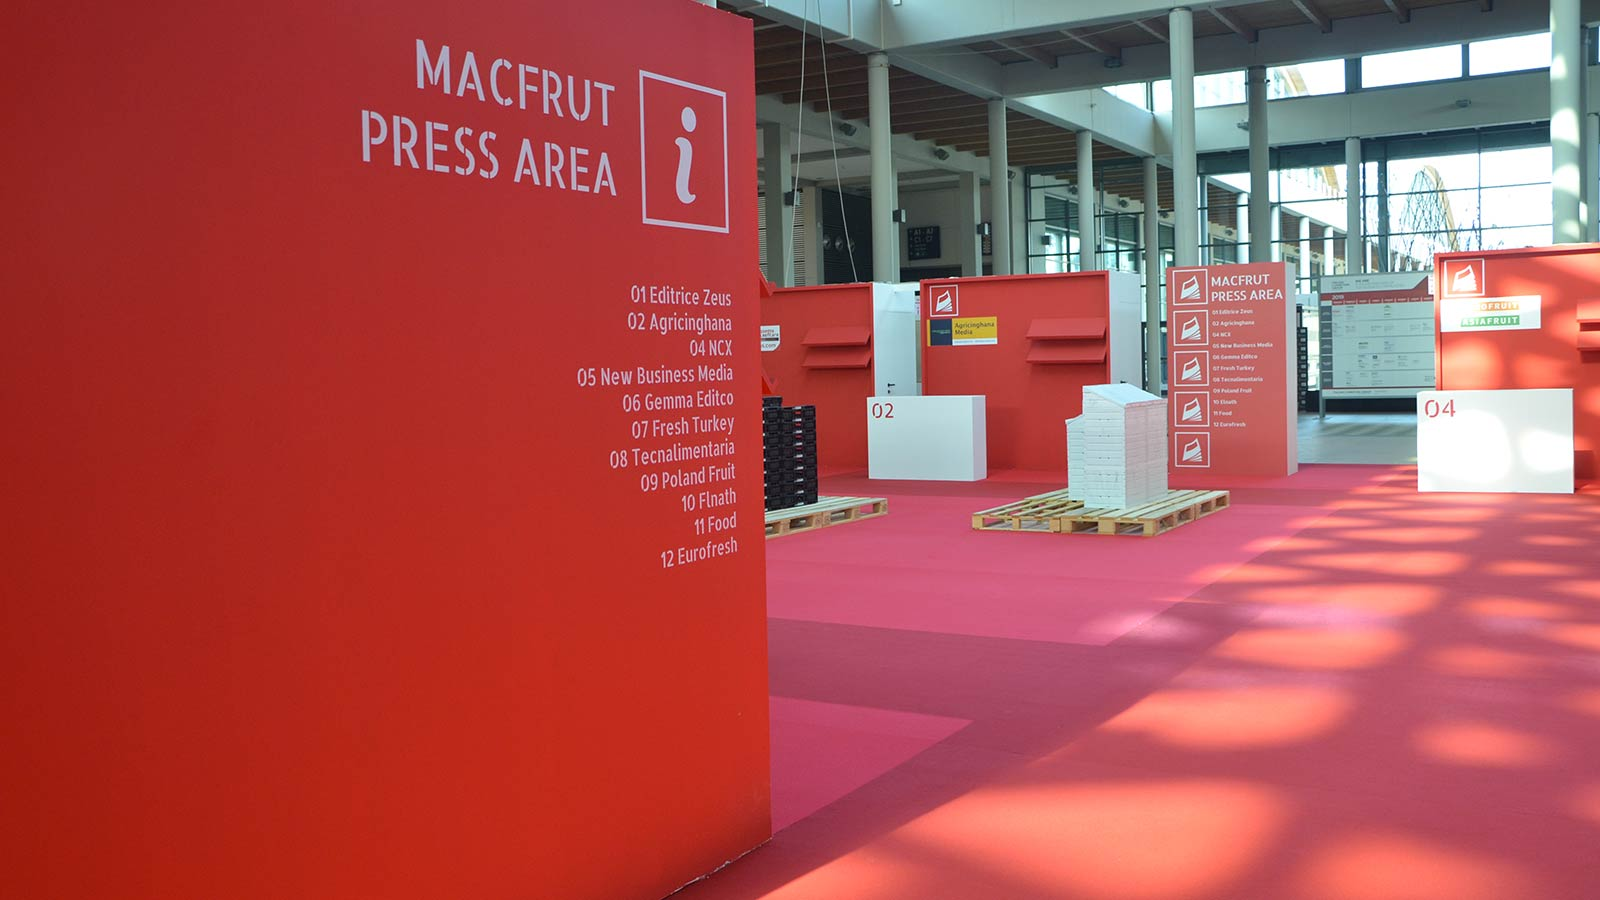 macfrut-2019-press-area